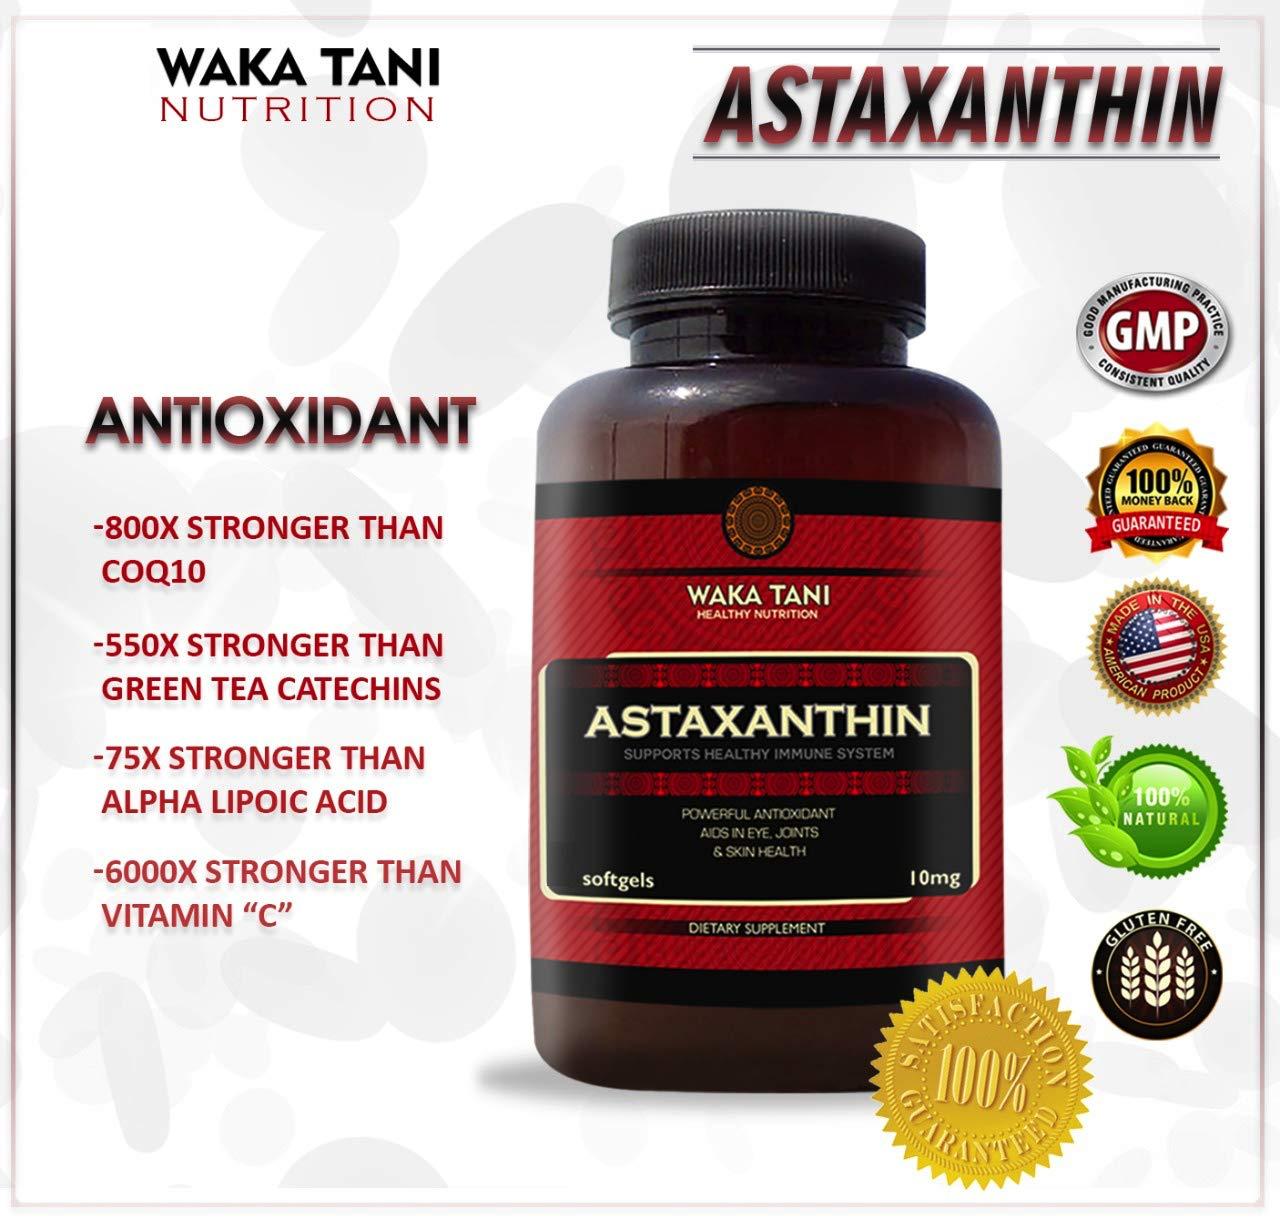 Astaxanthin 10mg 120 Softgels. Powerful Antioxidant & Anti-inflammatory Keto Carotenoid. Natural Algae Supplement. Recommended for: Skin, Joint, Brain, Eye, Cardiovascular & Immune System.